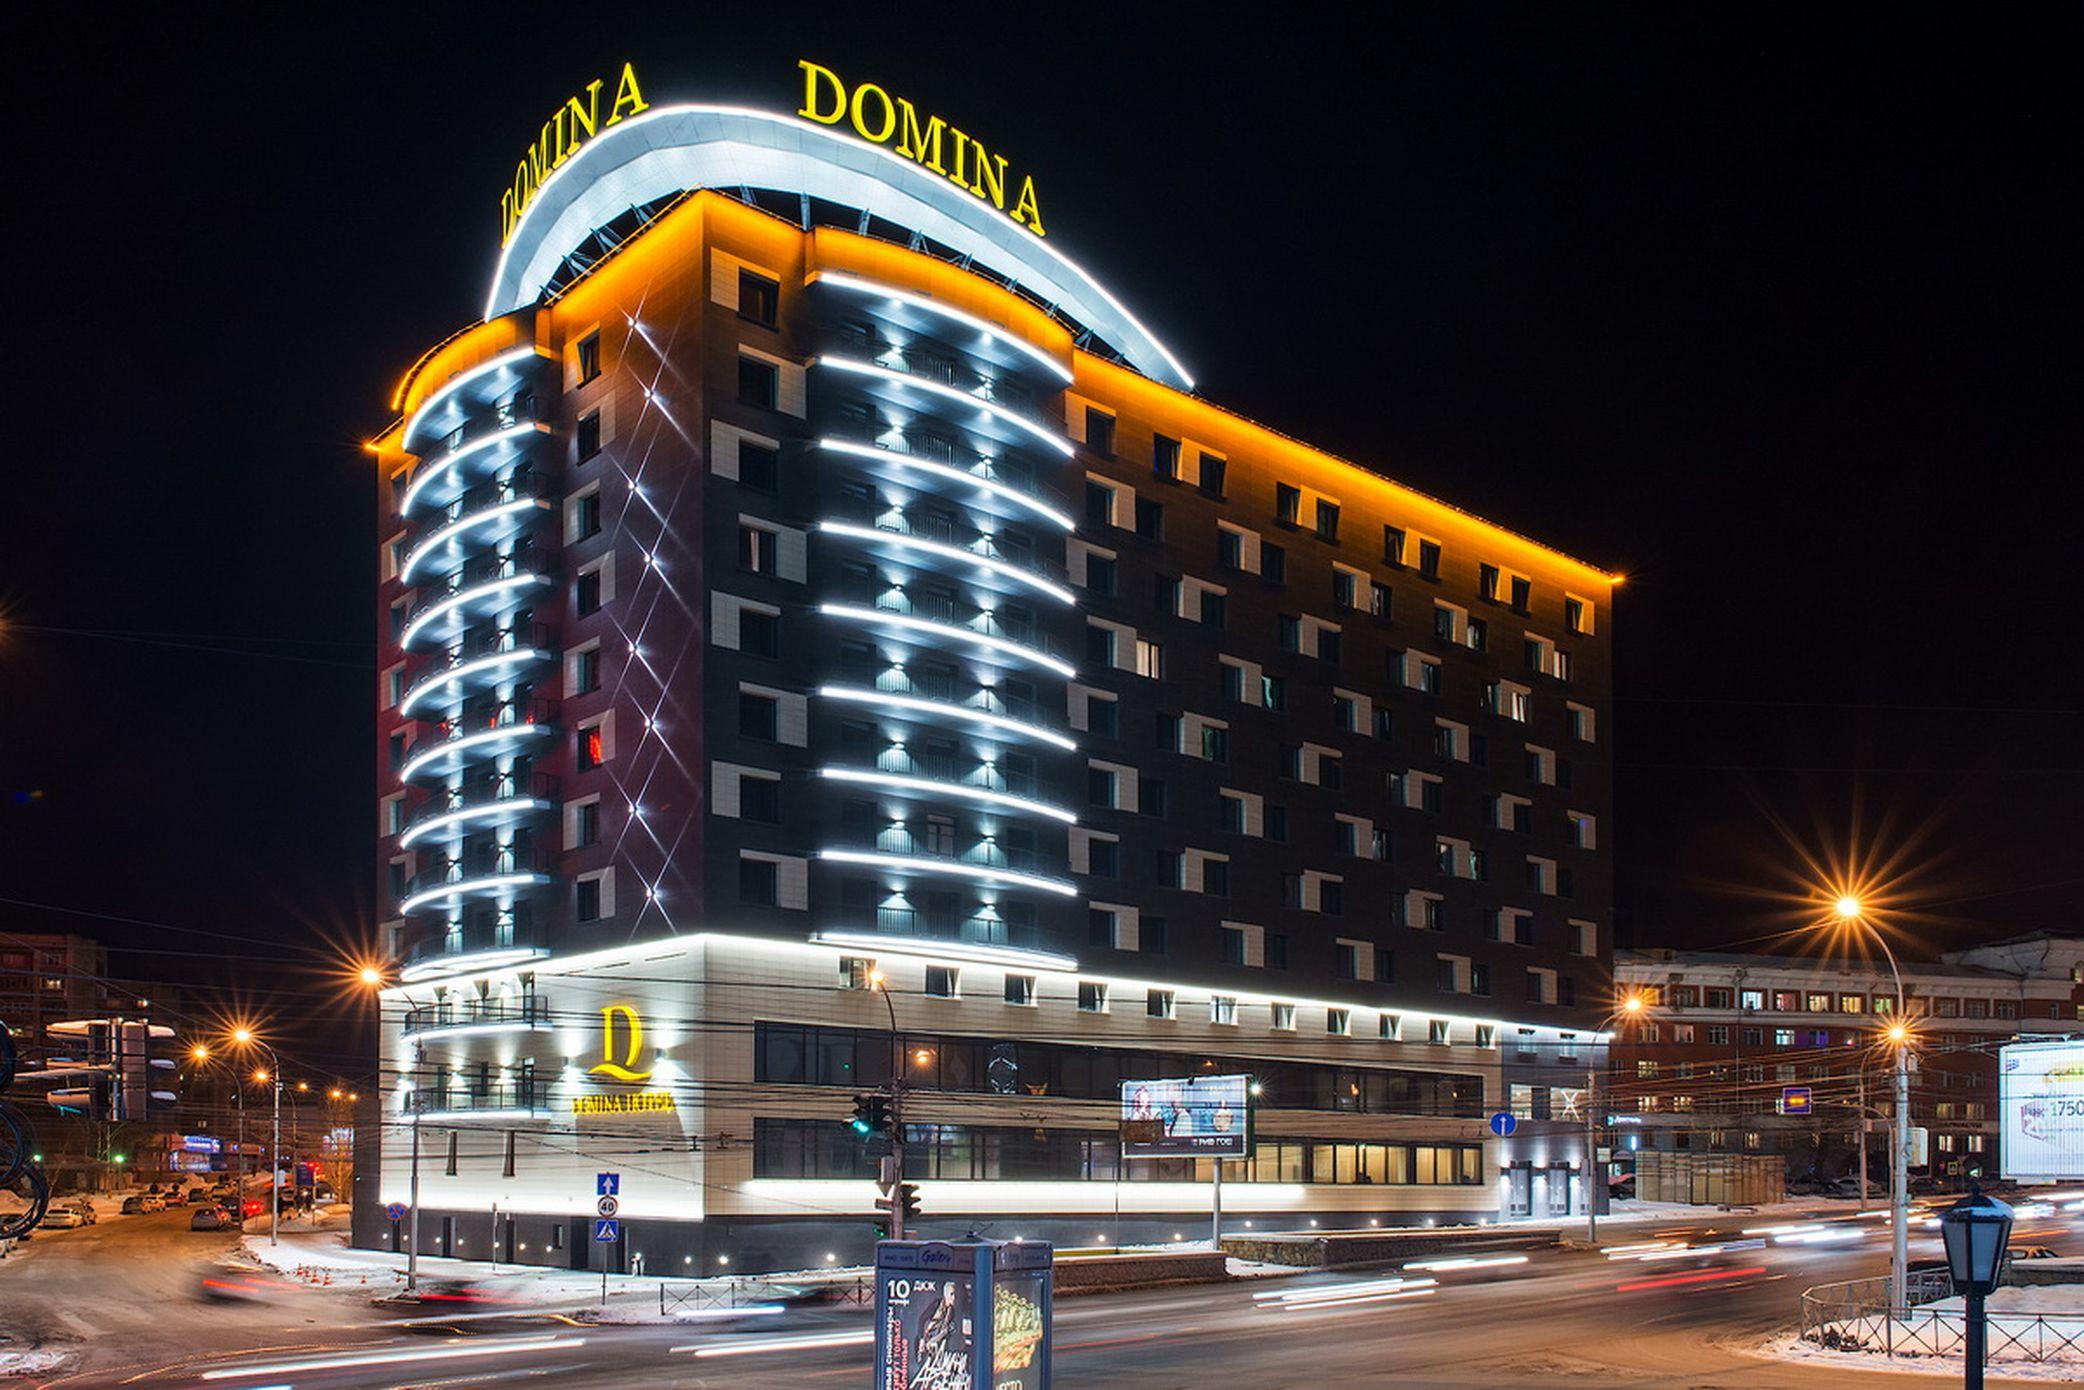 Domina Novosibirsk, Novosibirskiy rayon